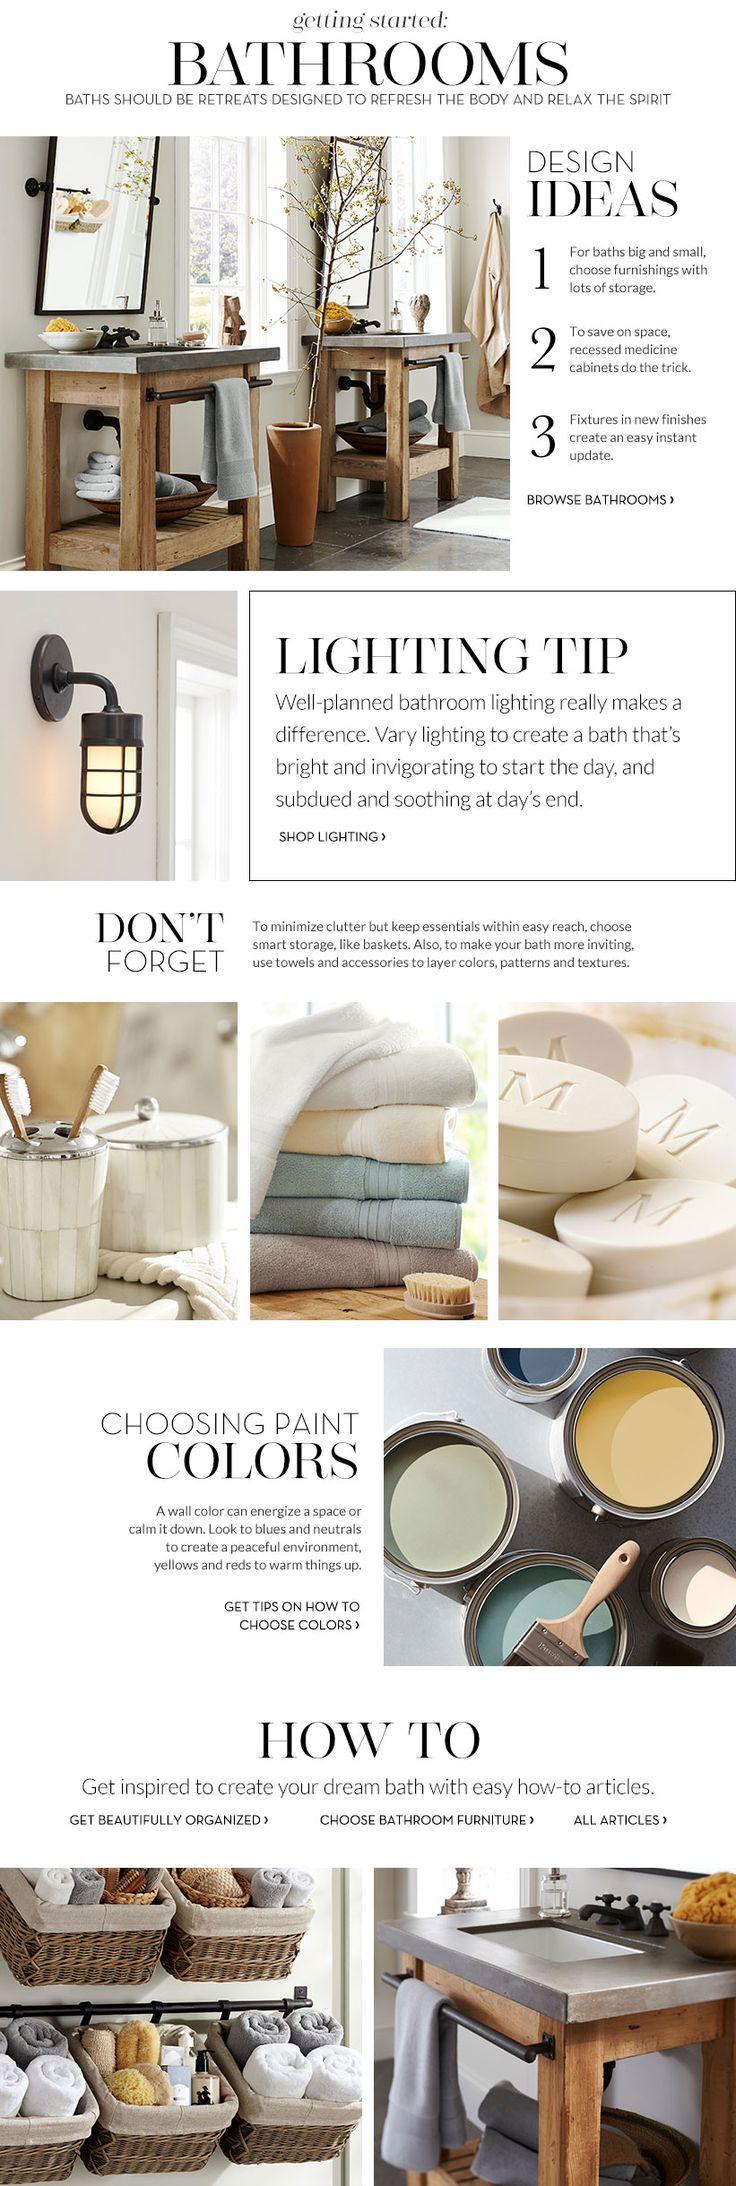 Bathroom Decor & Decorating Ideas | Pottery Barn